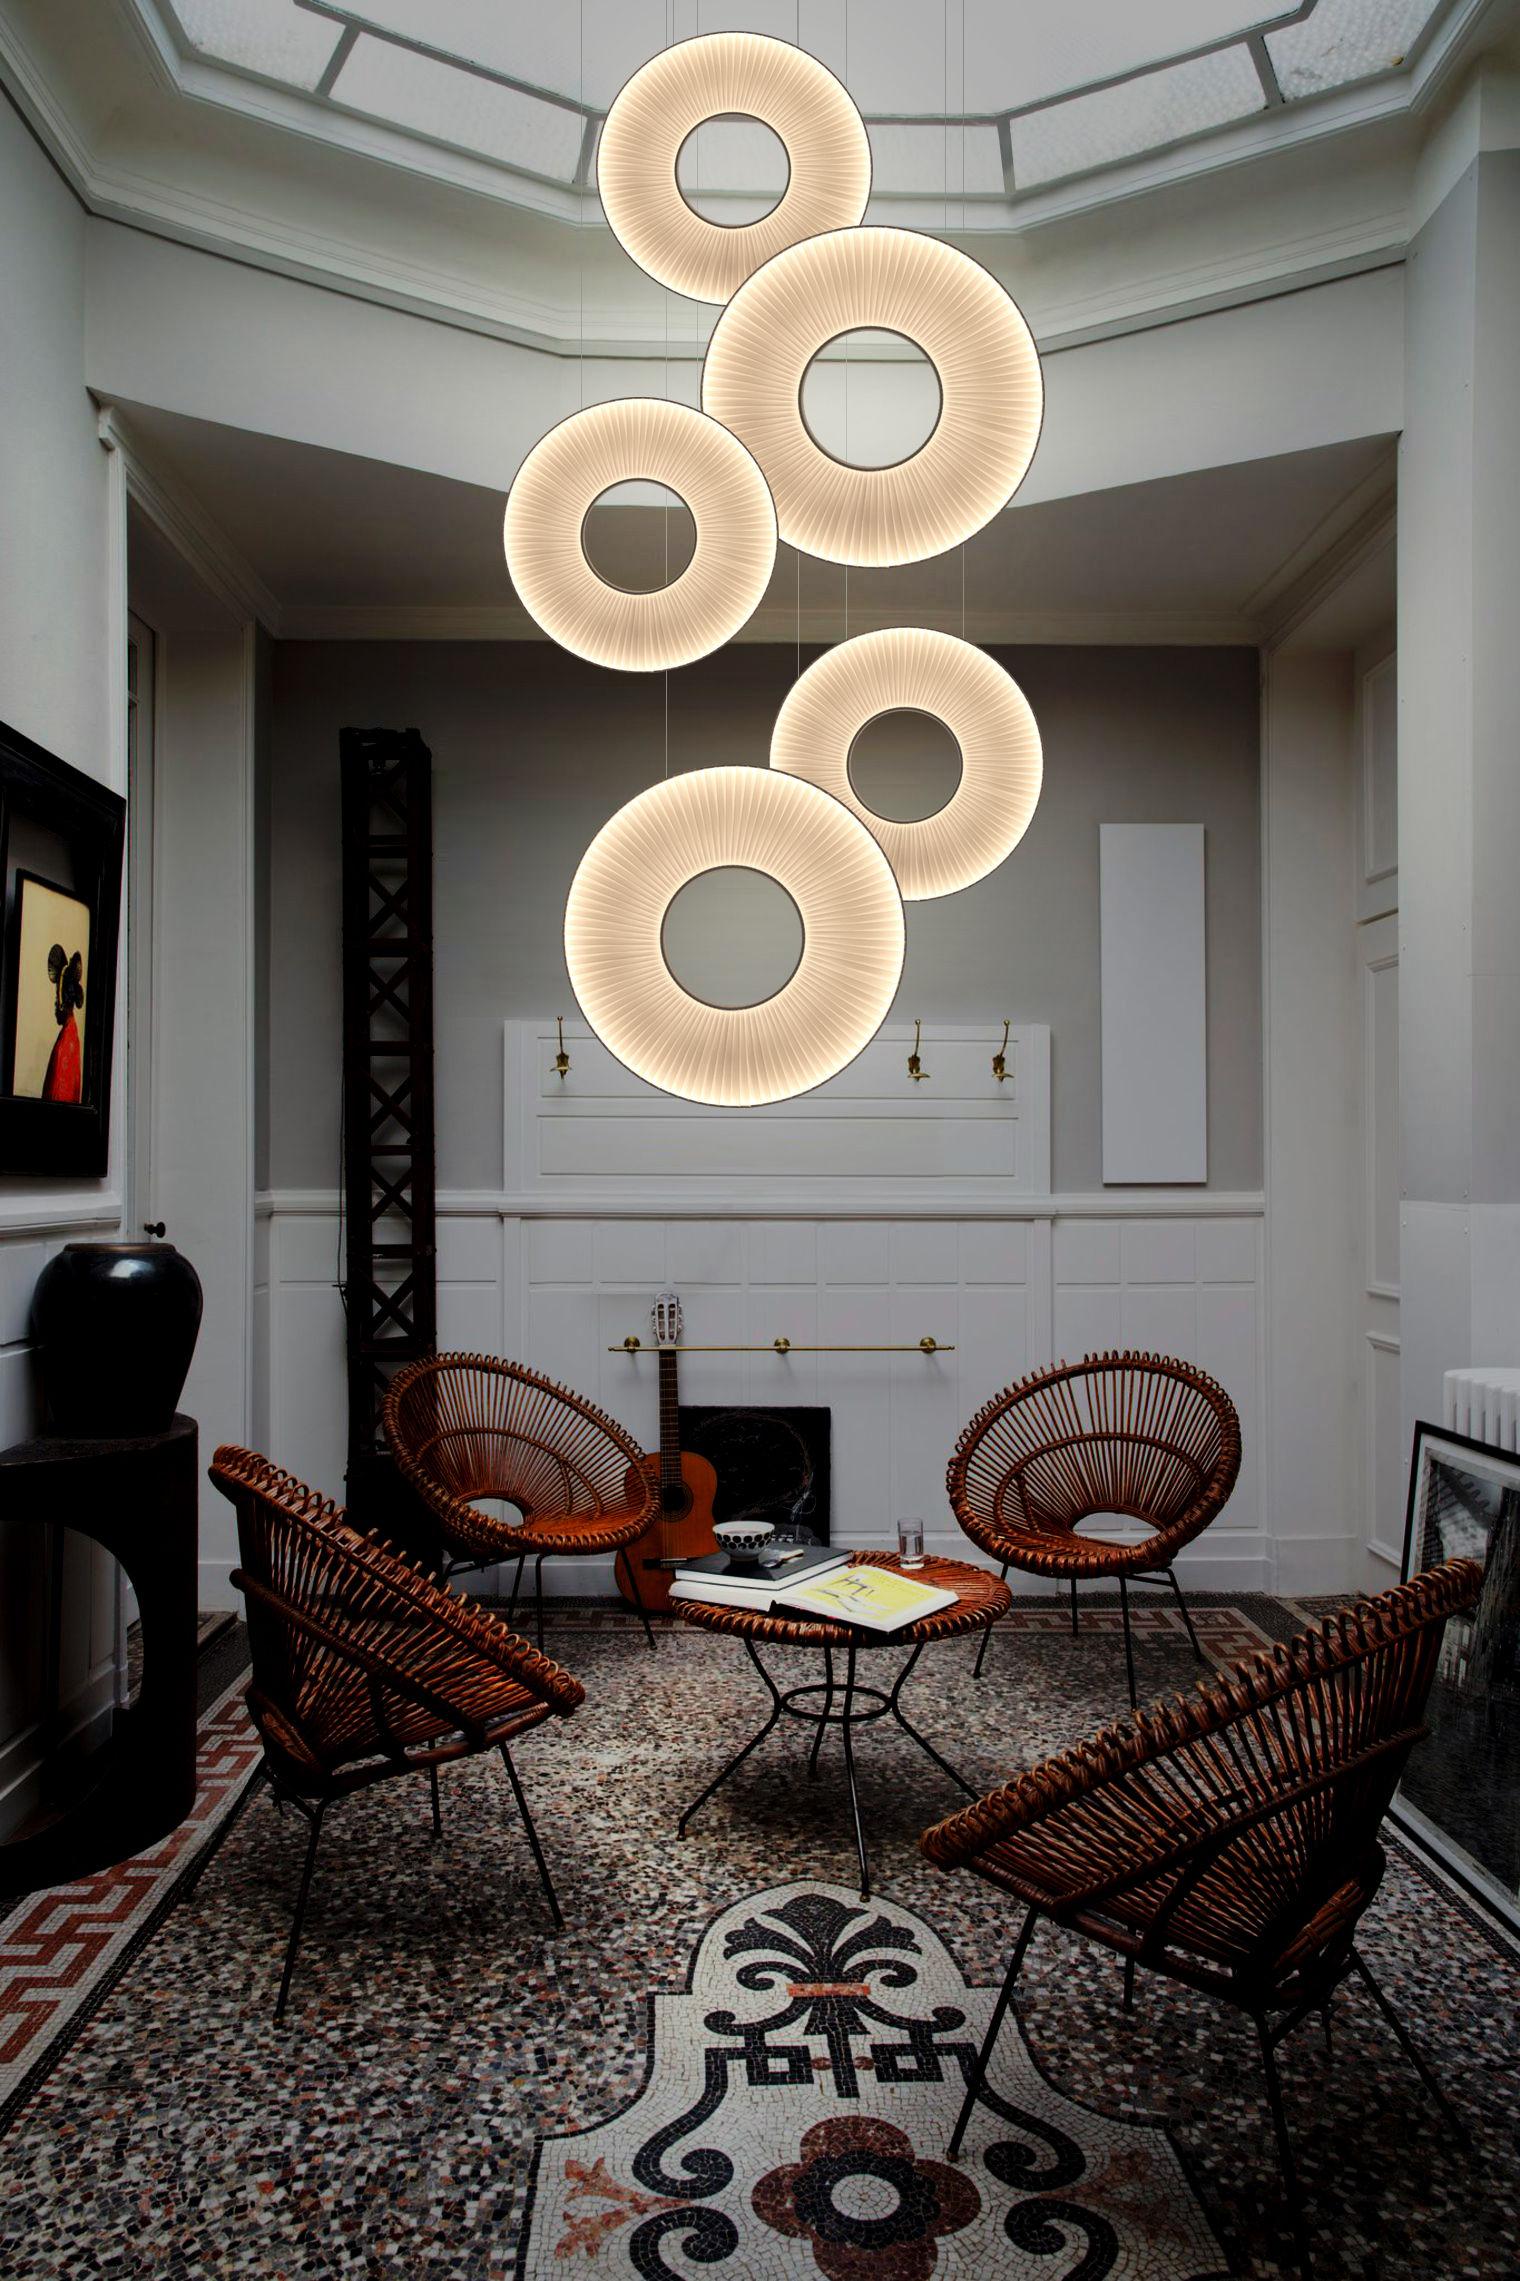 iris vertikal led 60 cm wei er stoff beidseitige beleuchtung dix heures dix. Black Bedroom Furniture Sets. Home Design Ideas